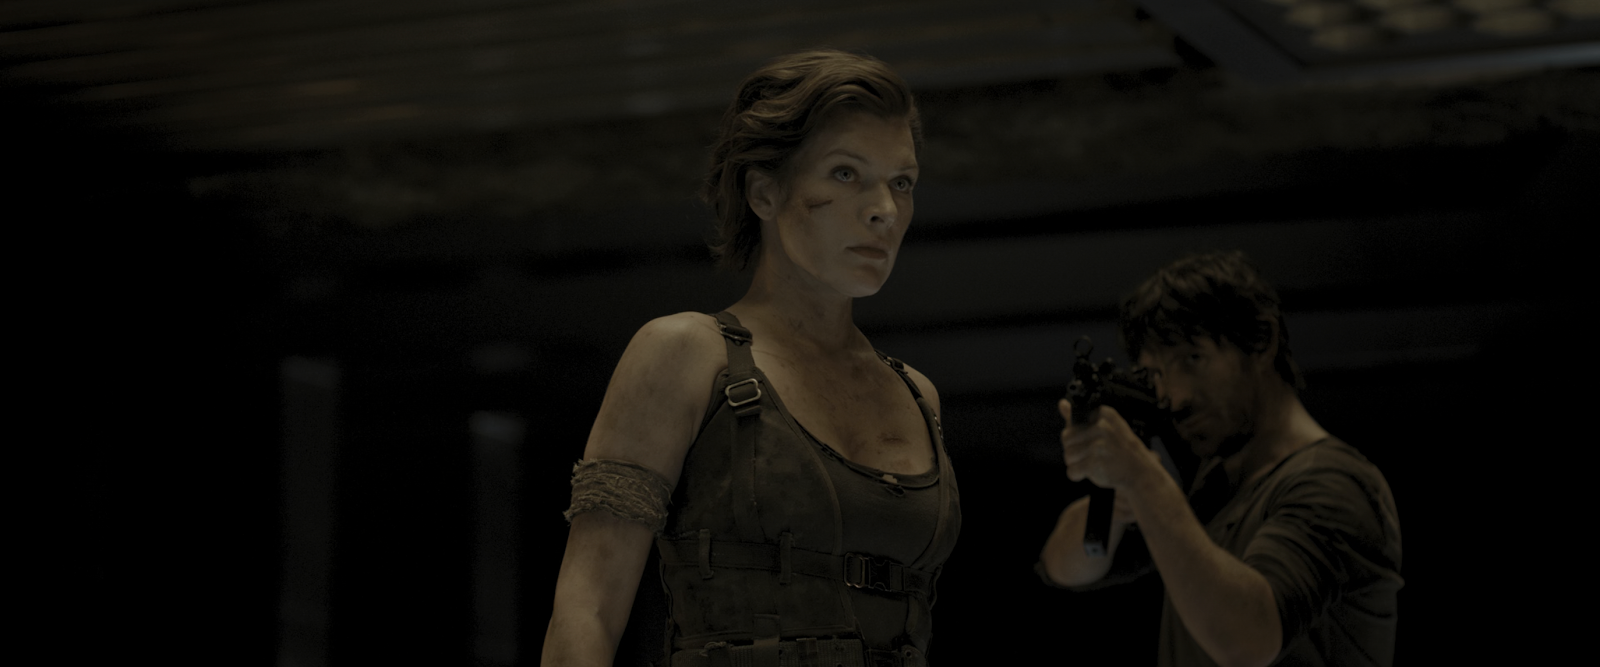 Resident Evil: Capítulo Final (2016) 4K UHD [HDR] Latino - Castellano- Ingles captura 4